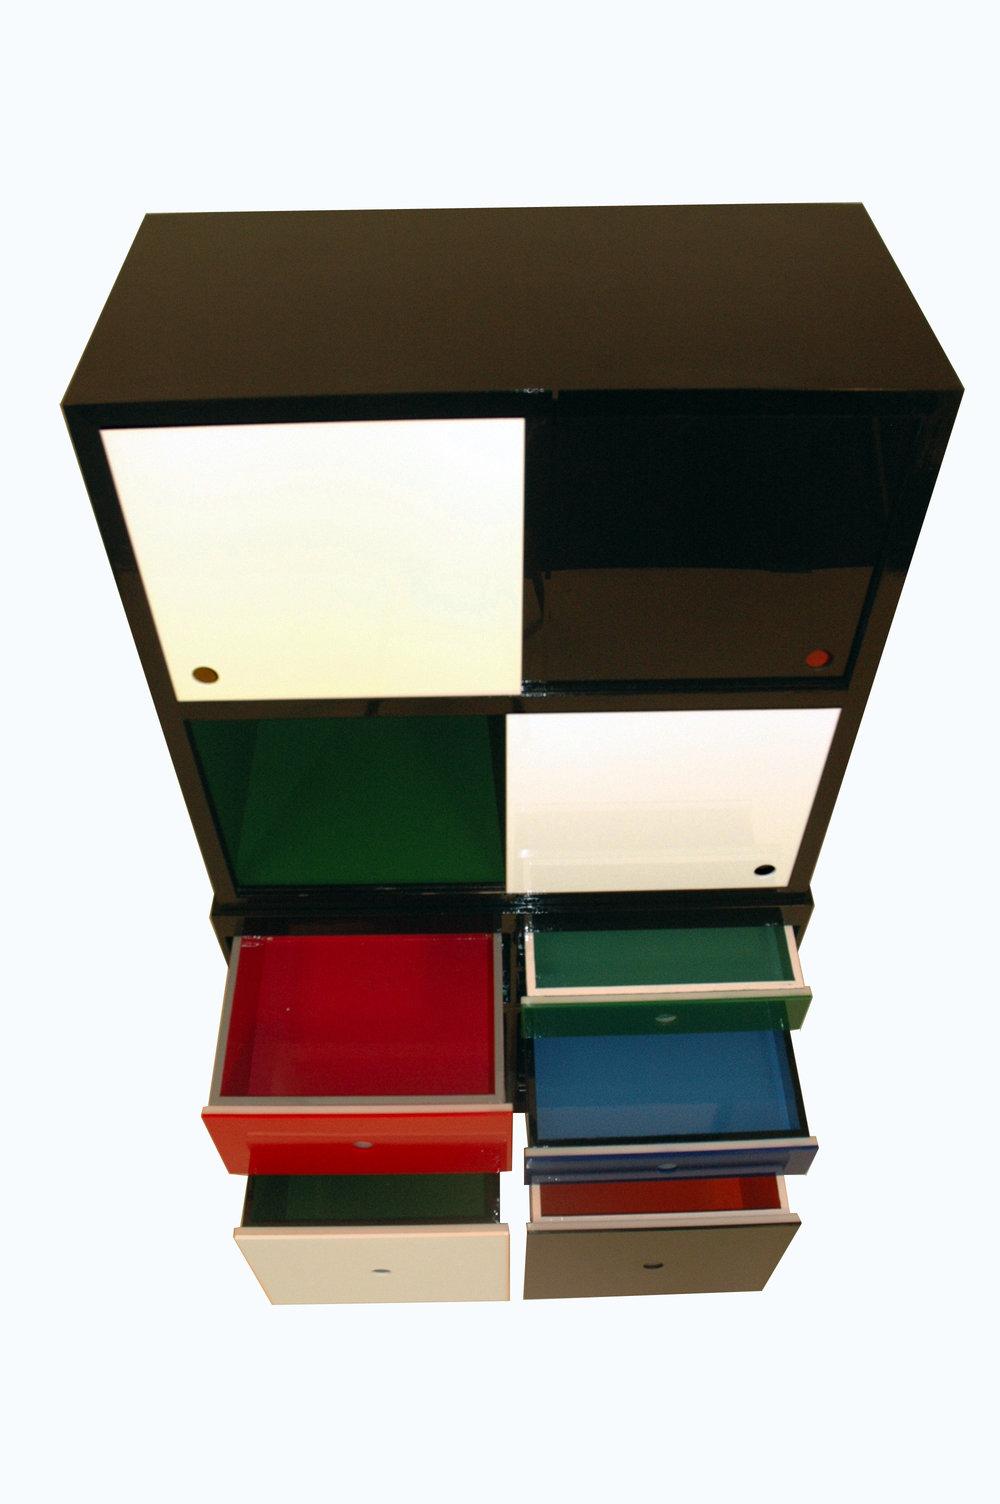 nikita cabinet2034.jpg